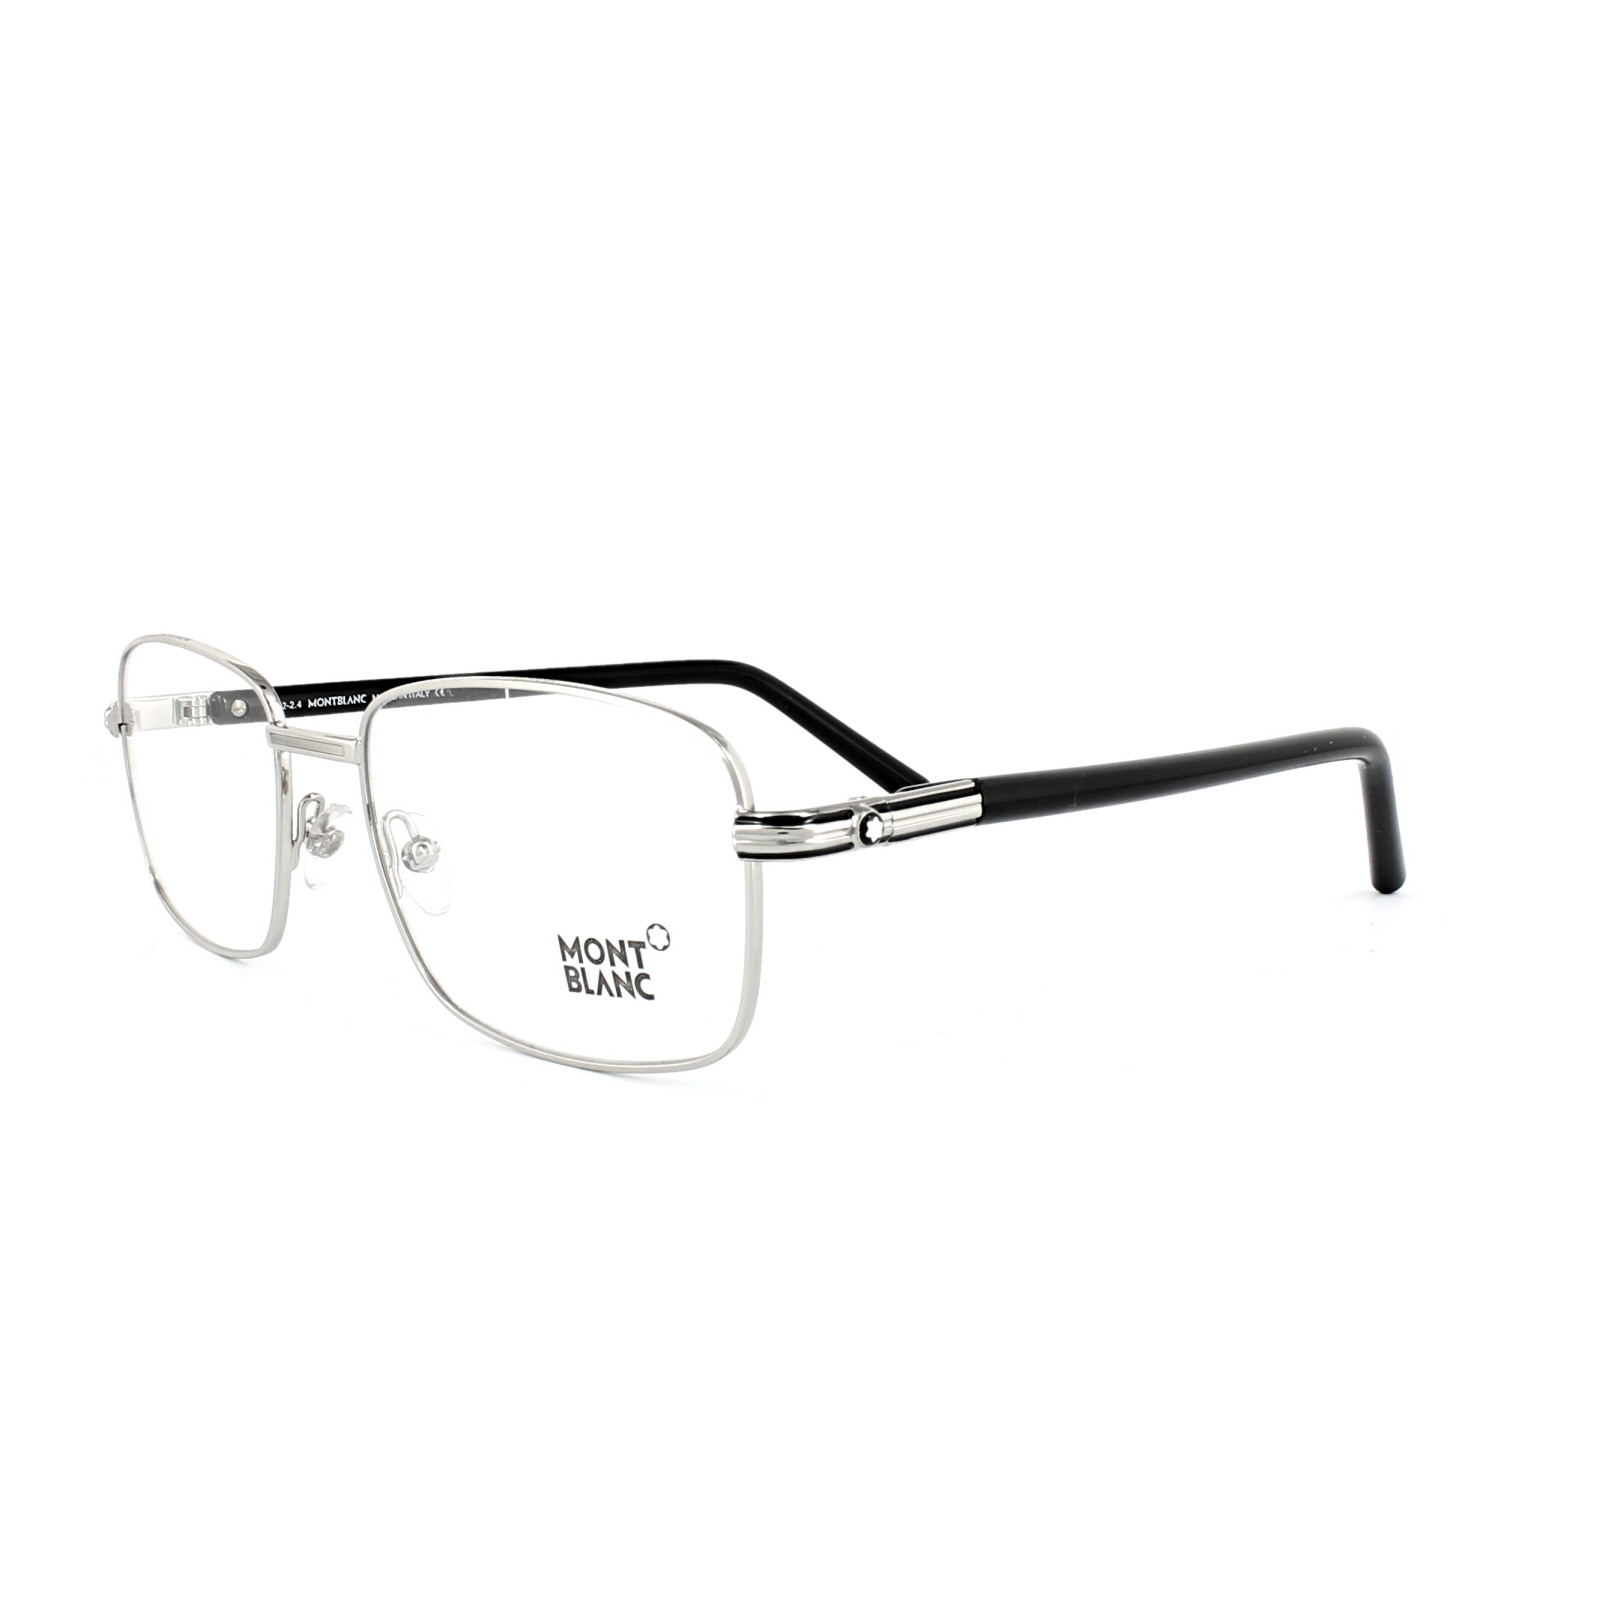 7793d433da Mont Blanc Glasses   Frames - Discounted Sunglasses